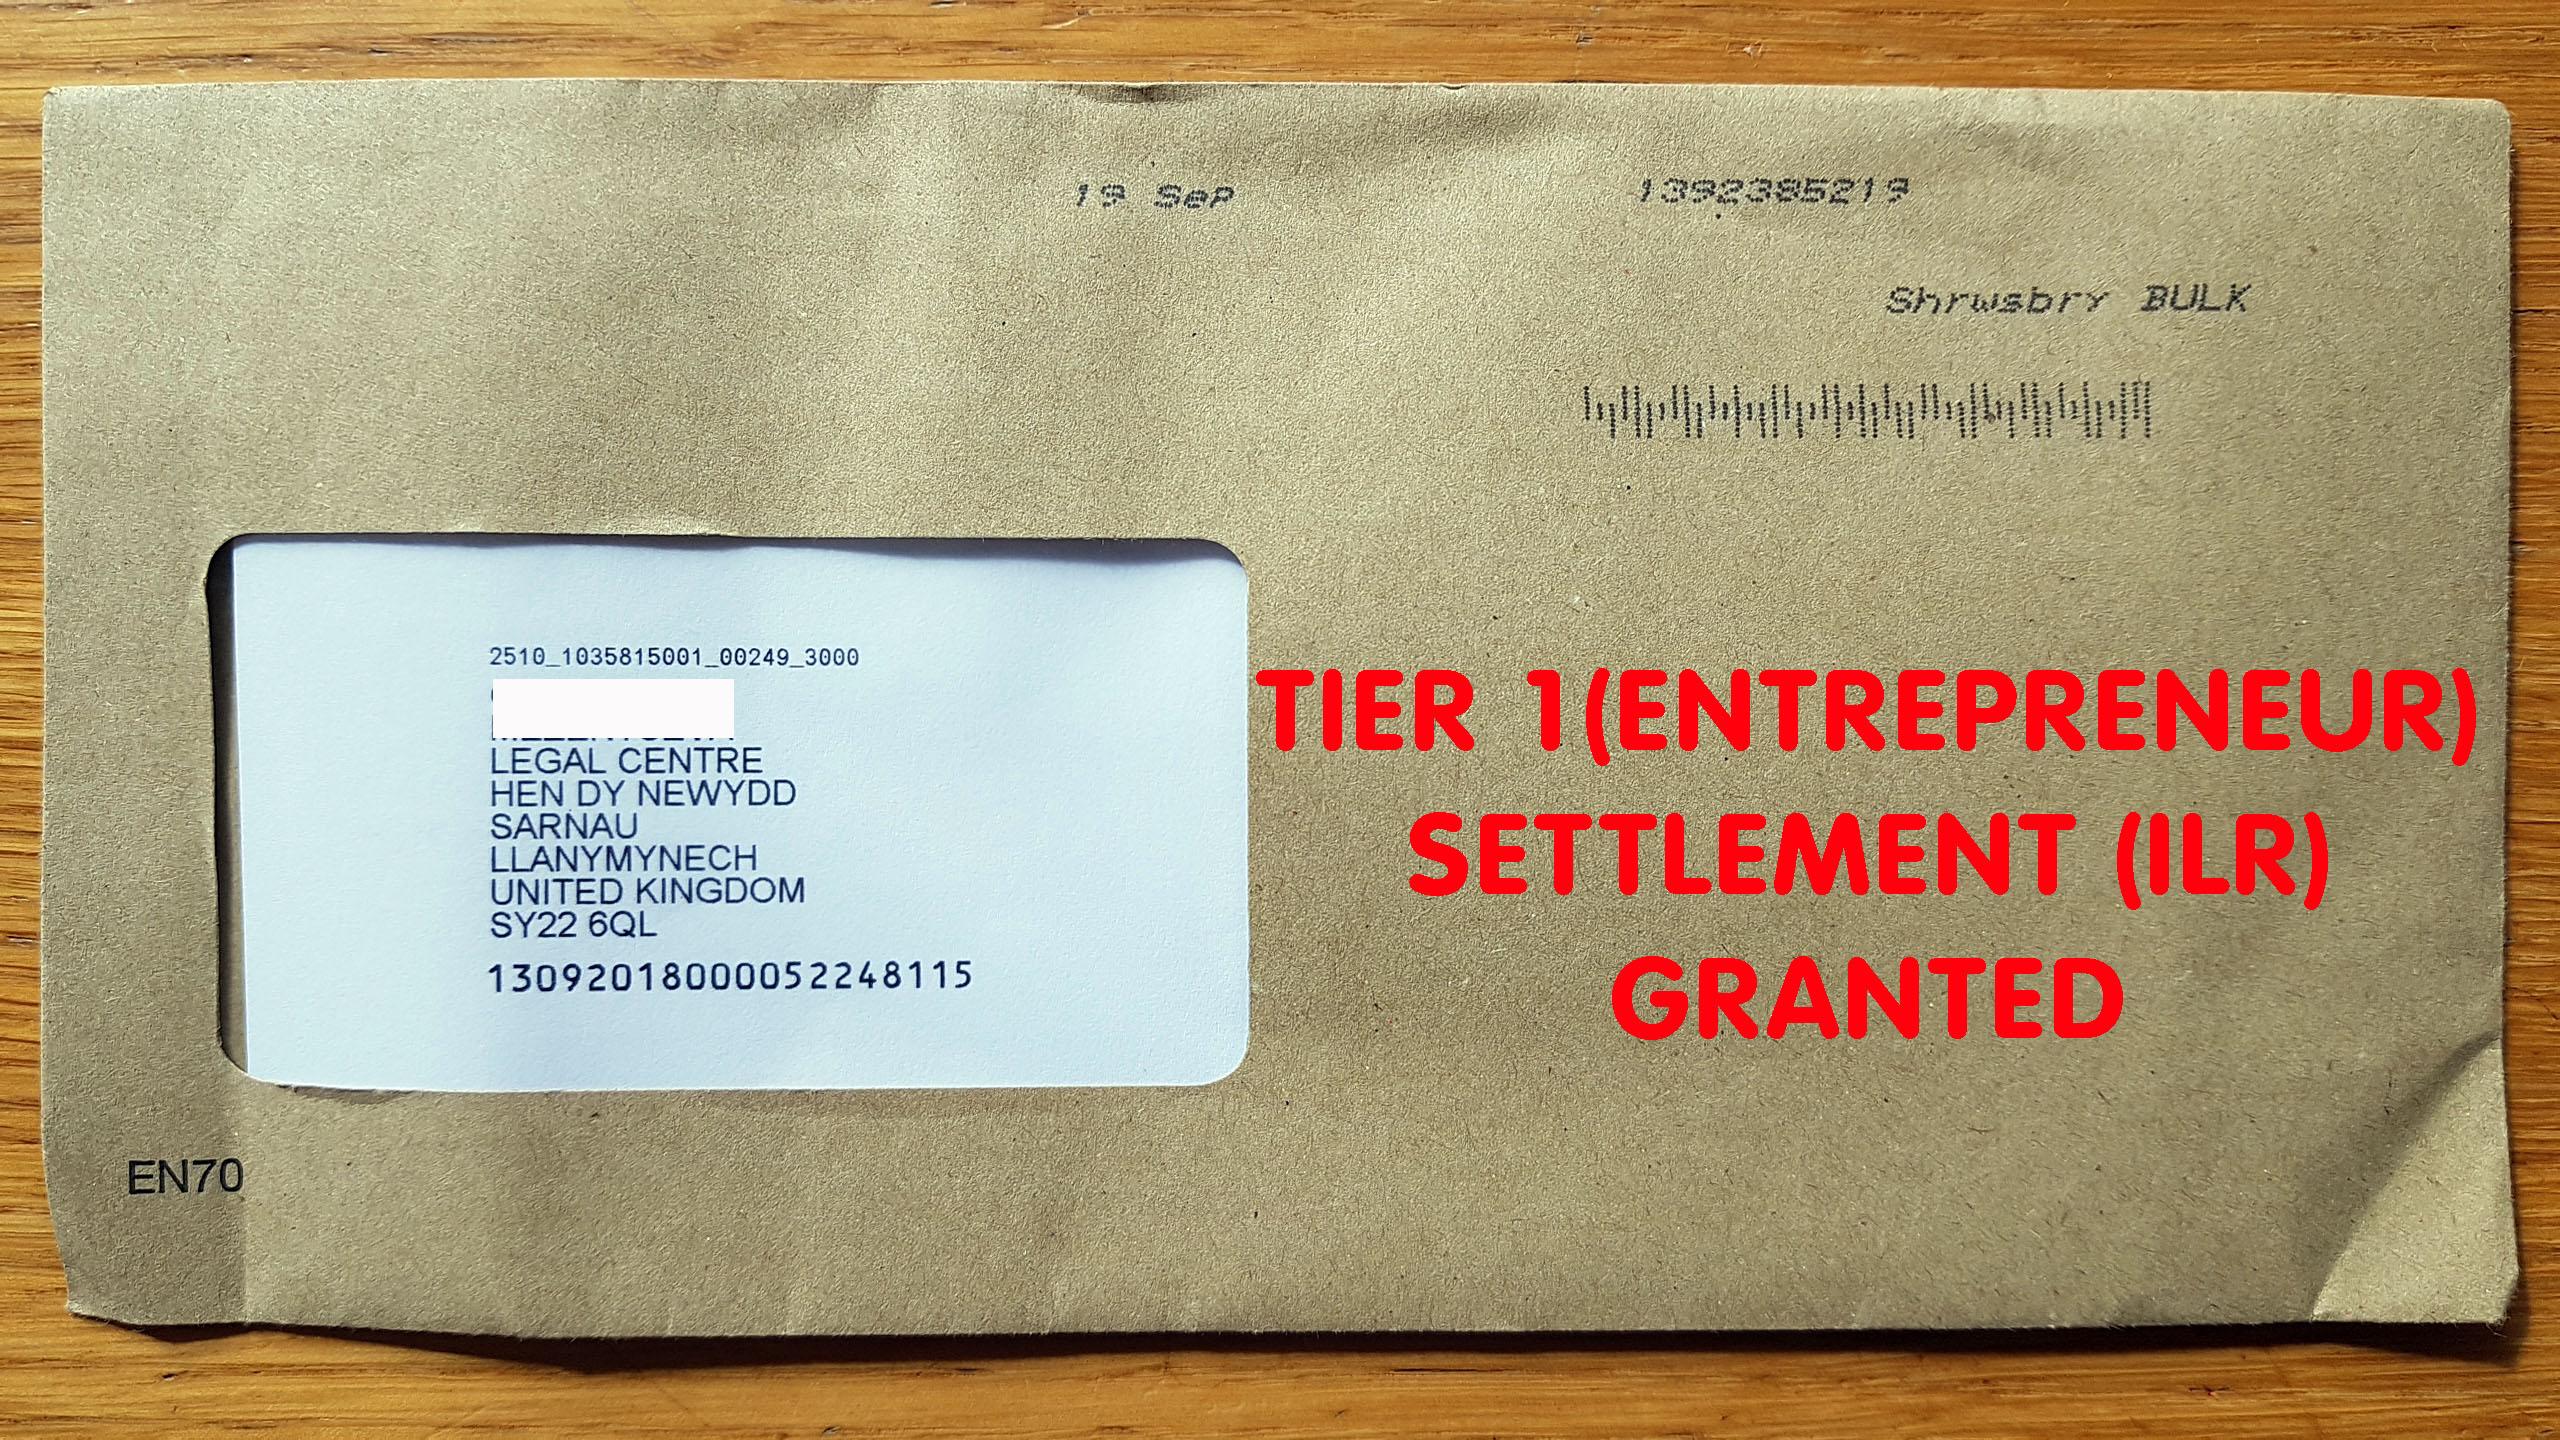 Tier1_Entrepreneur_Granted_thank_to_Anton_Koval_Legal_Centre_07791145023_www.legalcentre.jpg